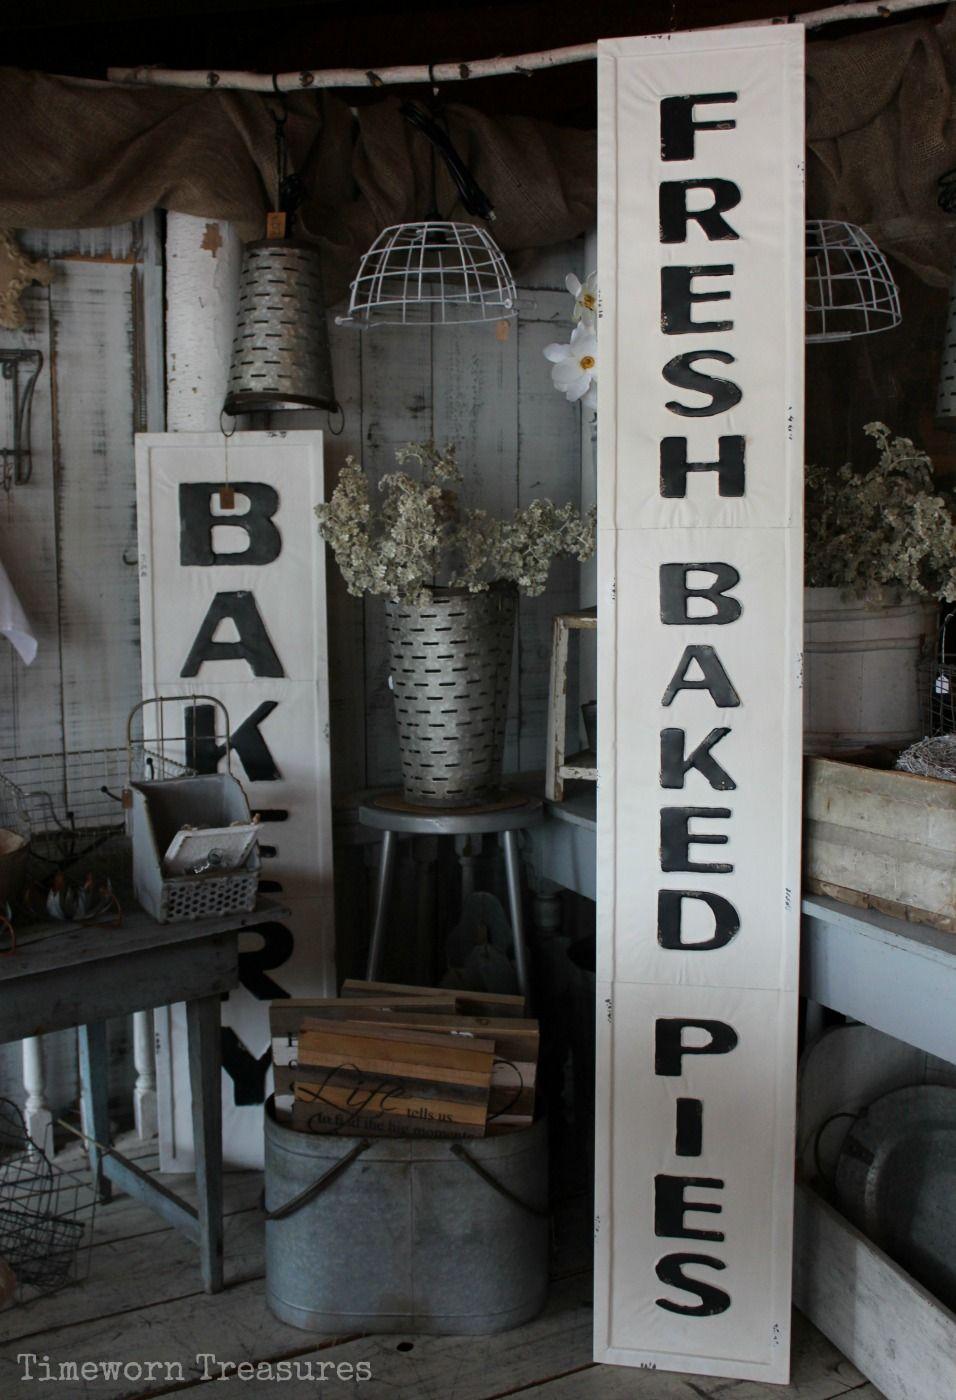 FRESH DAILY Vintage Style Enamel Sign Country Farmhouse Kitchen Wall Decor NEW